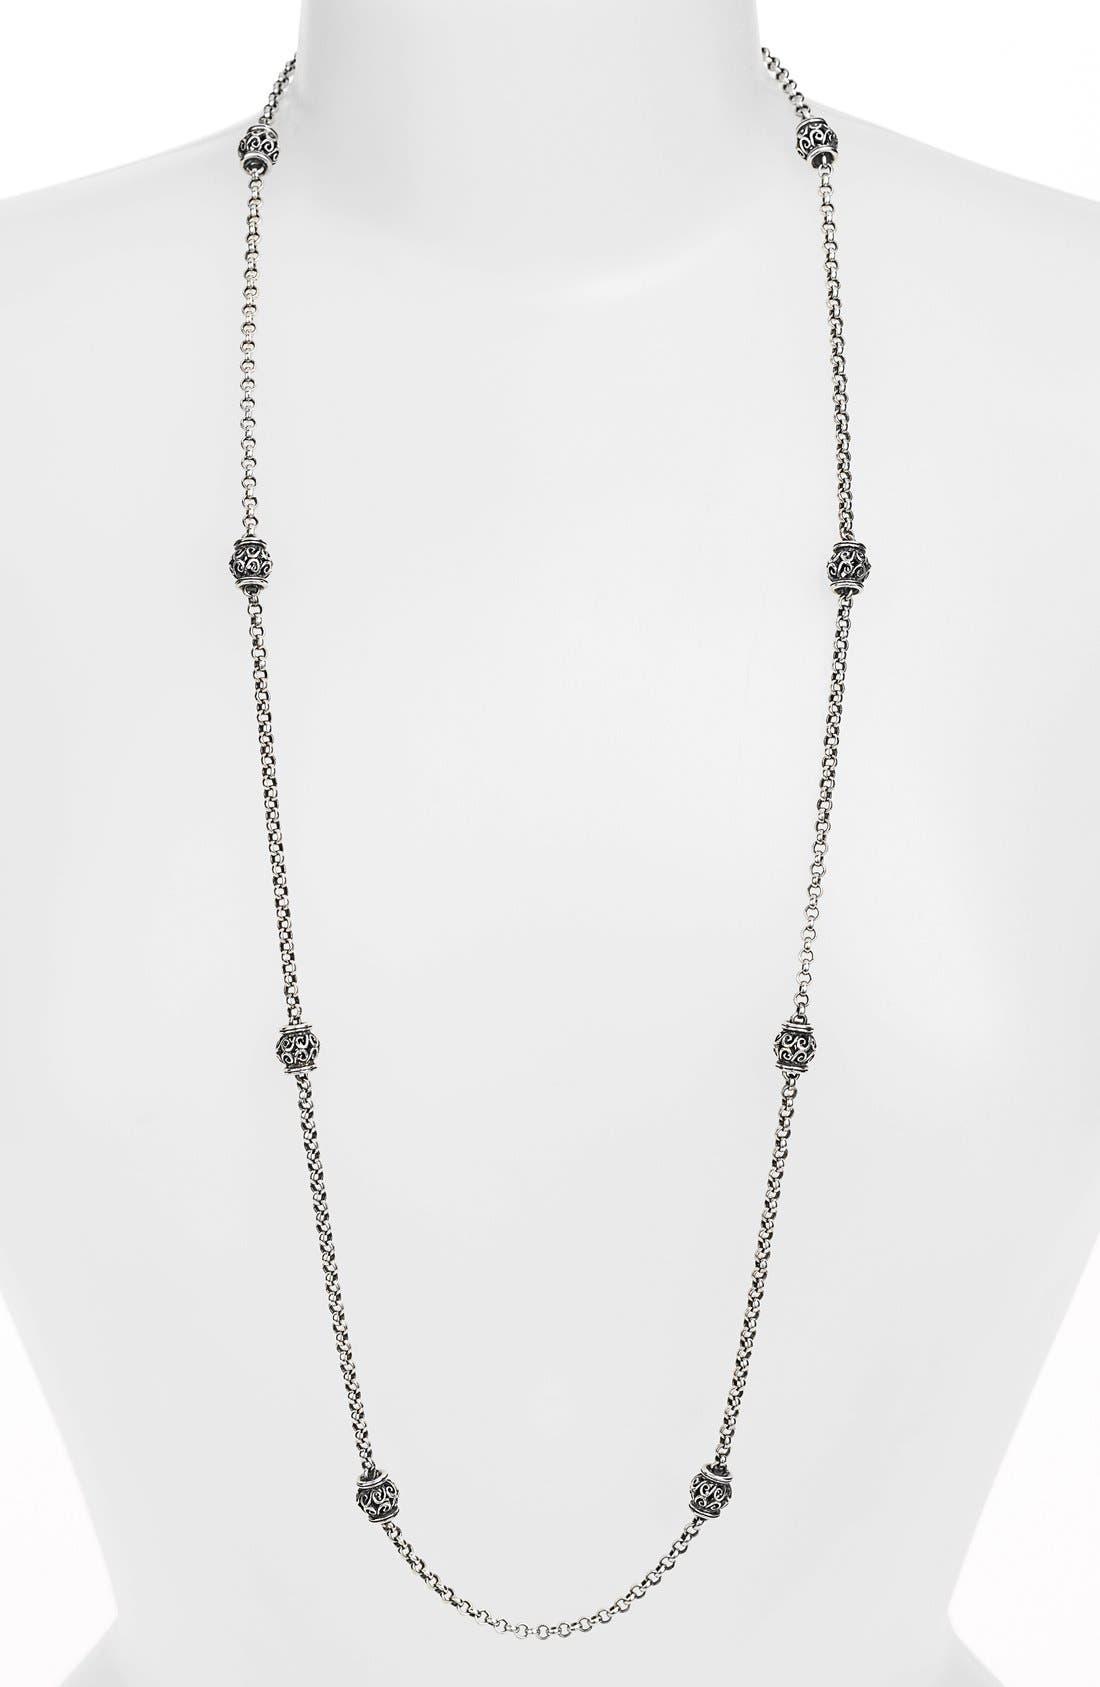 Main Image - Konstantino 'Classics' Long Station Necklace